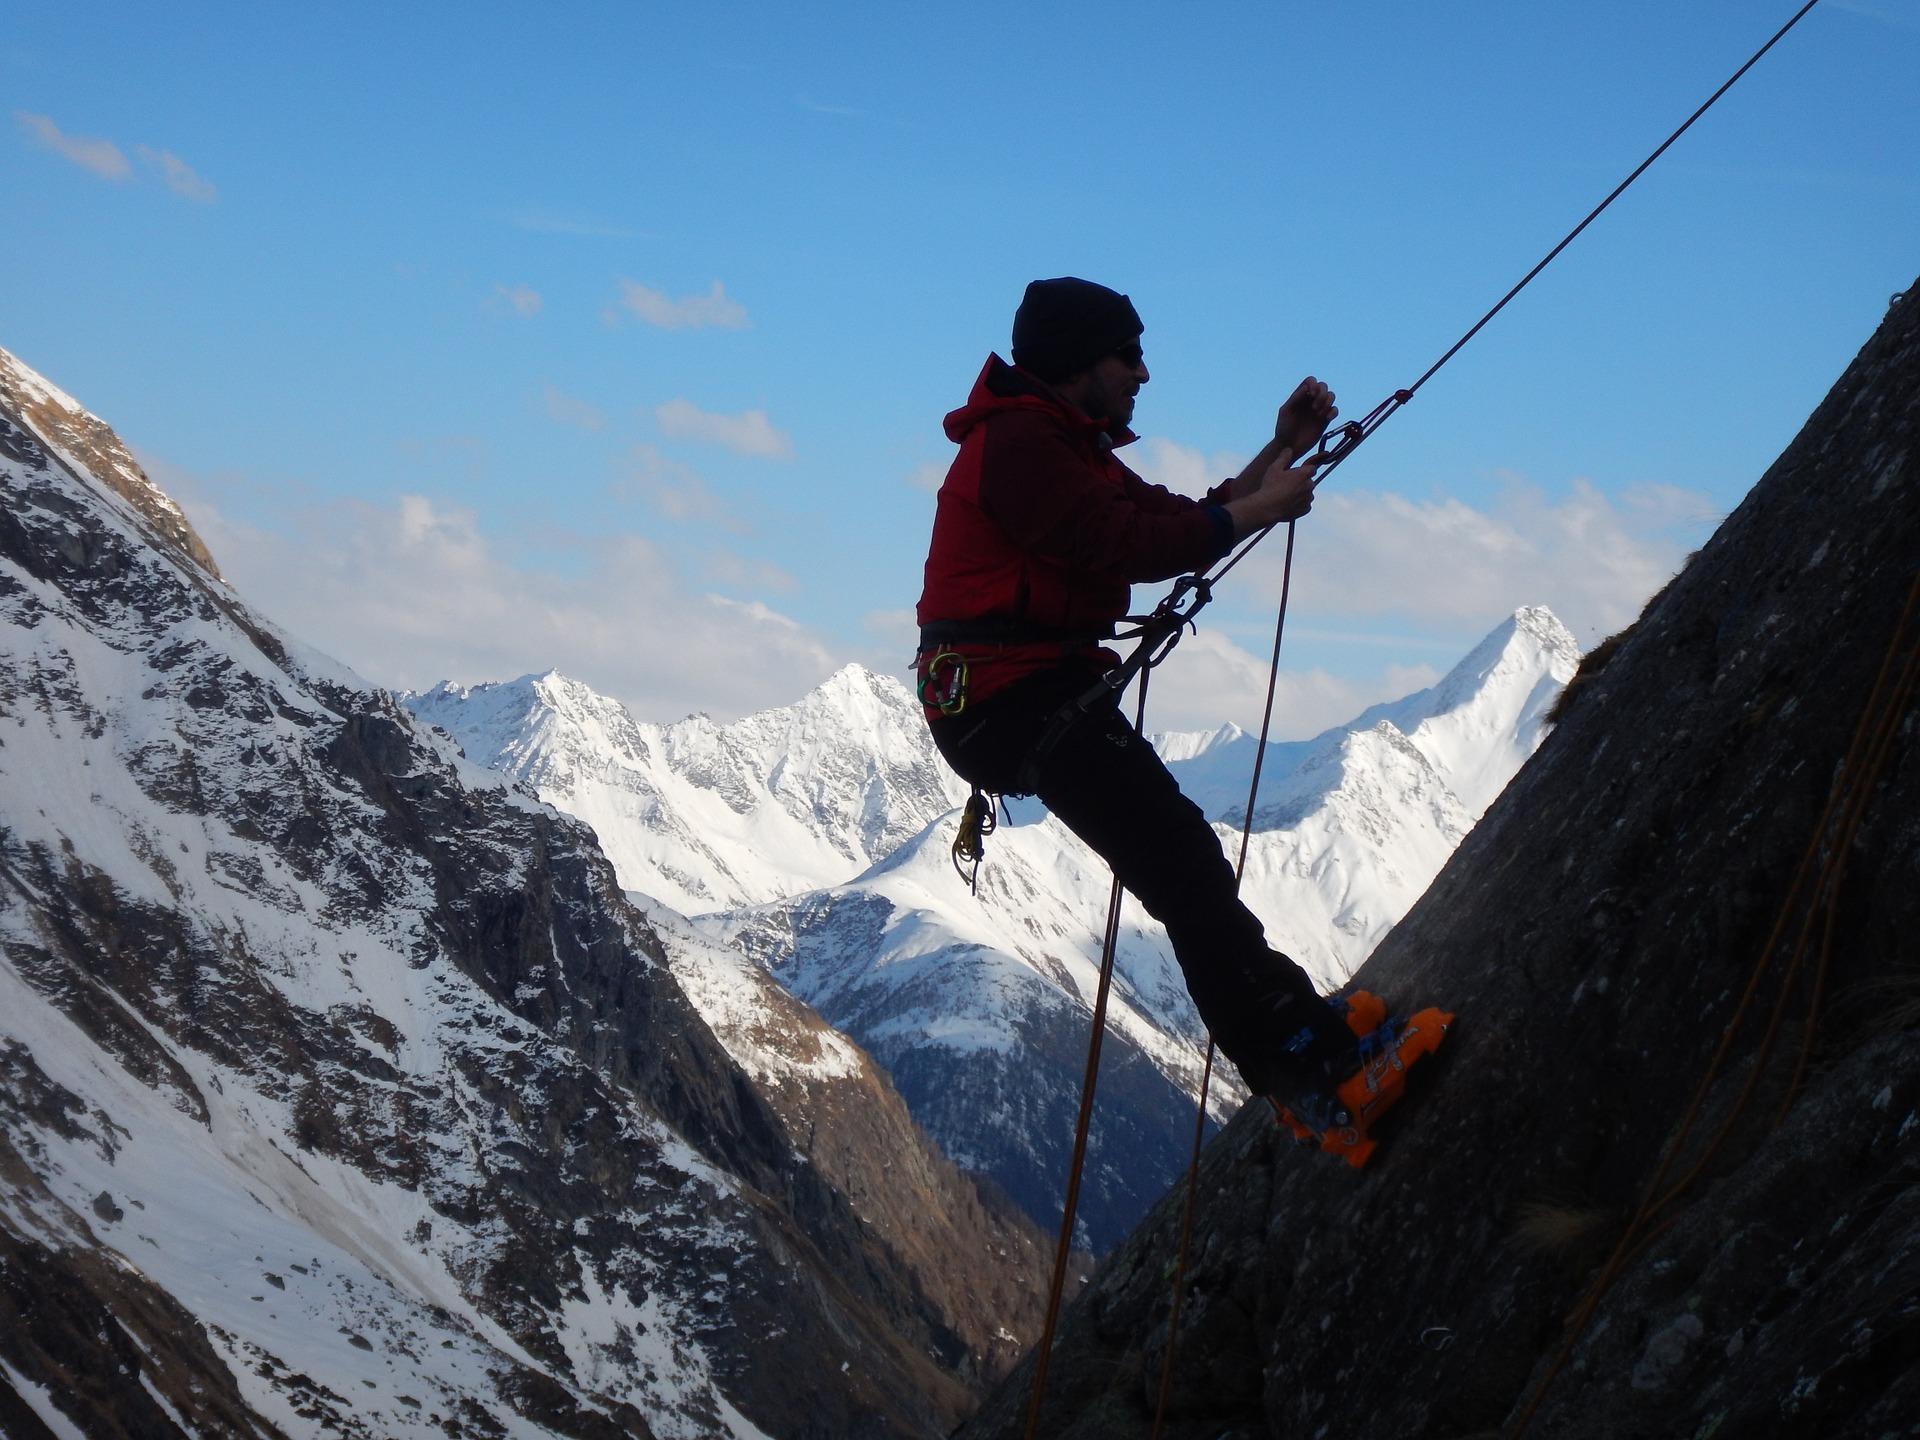 climb-1366823_1920